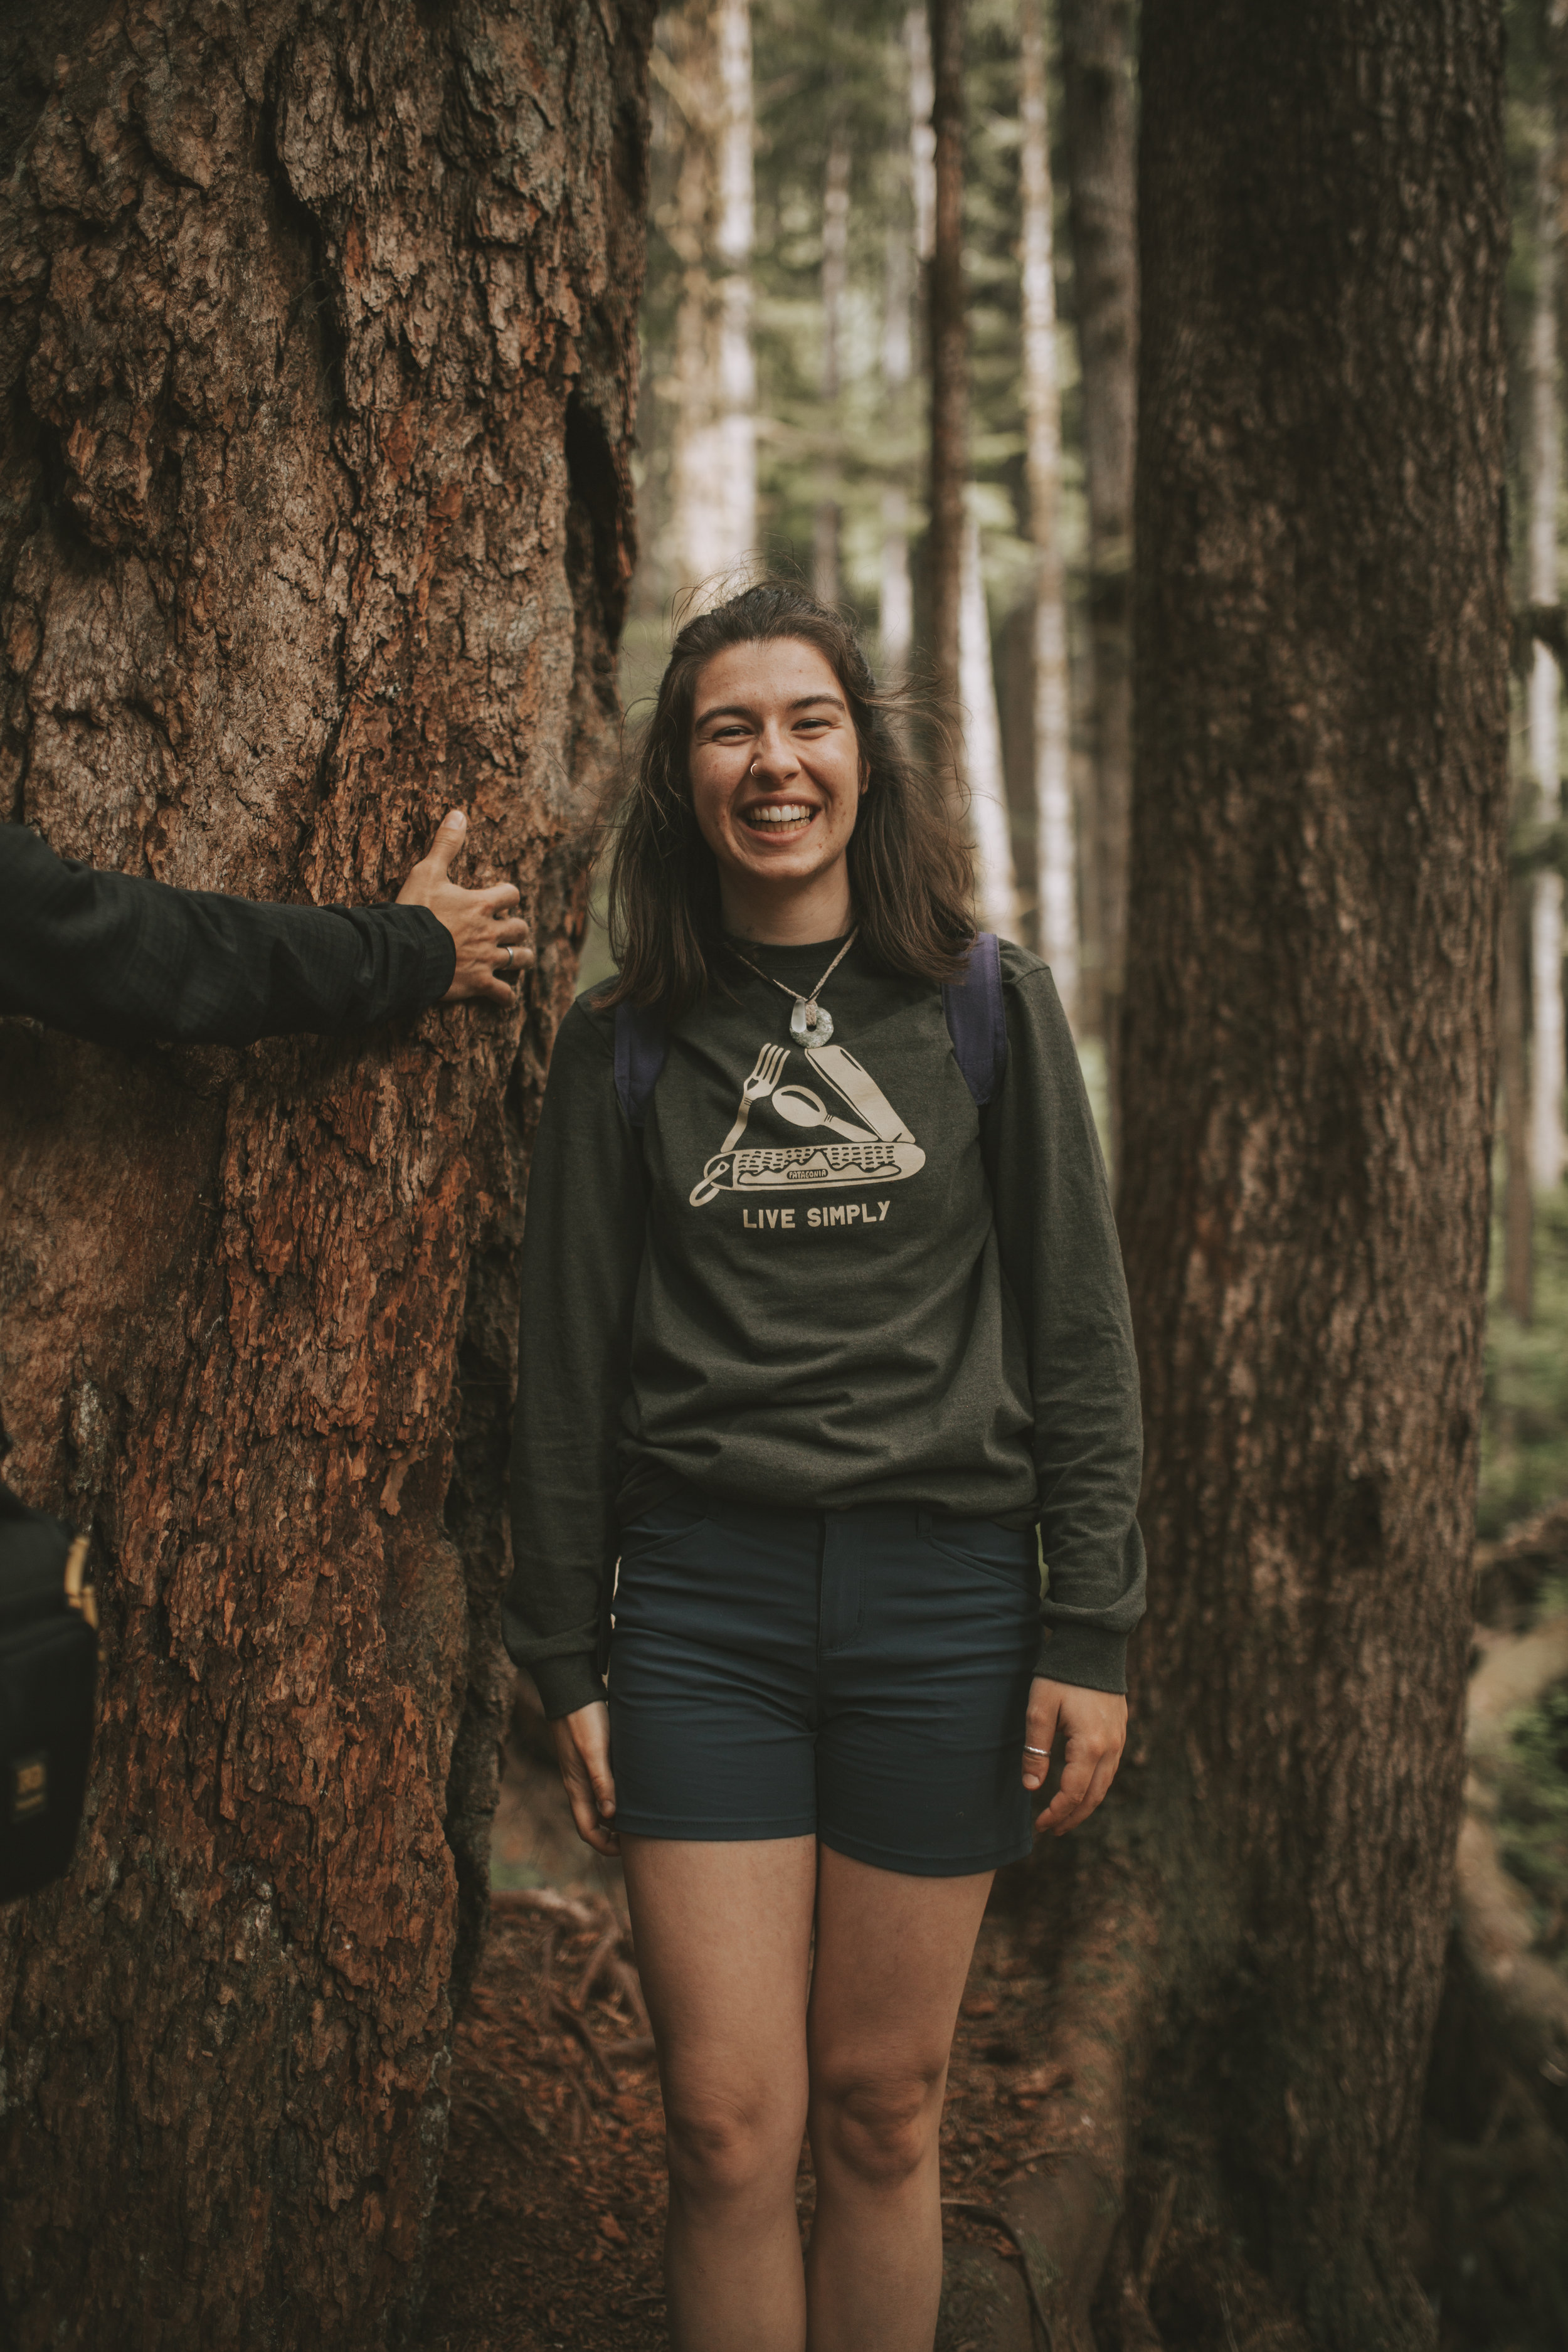 patagonia-2019-emilybeekscreative-34.jpg